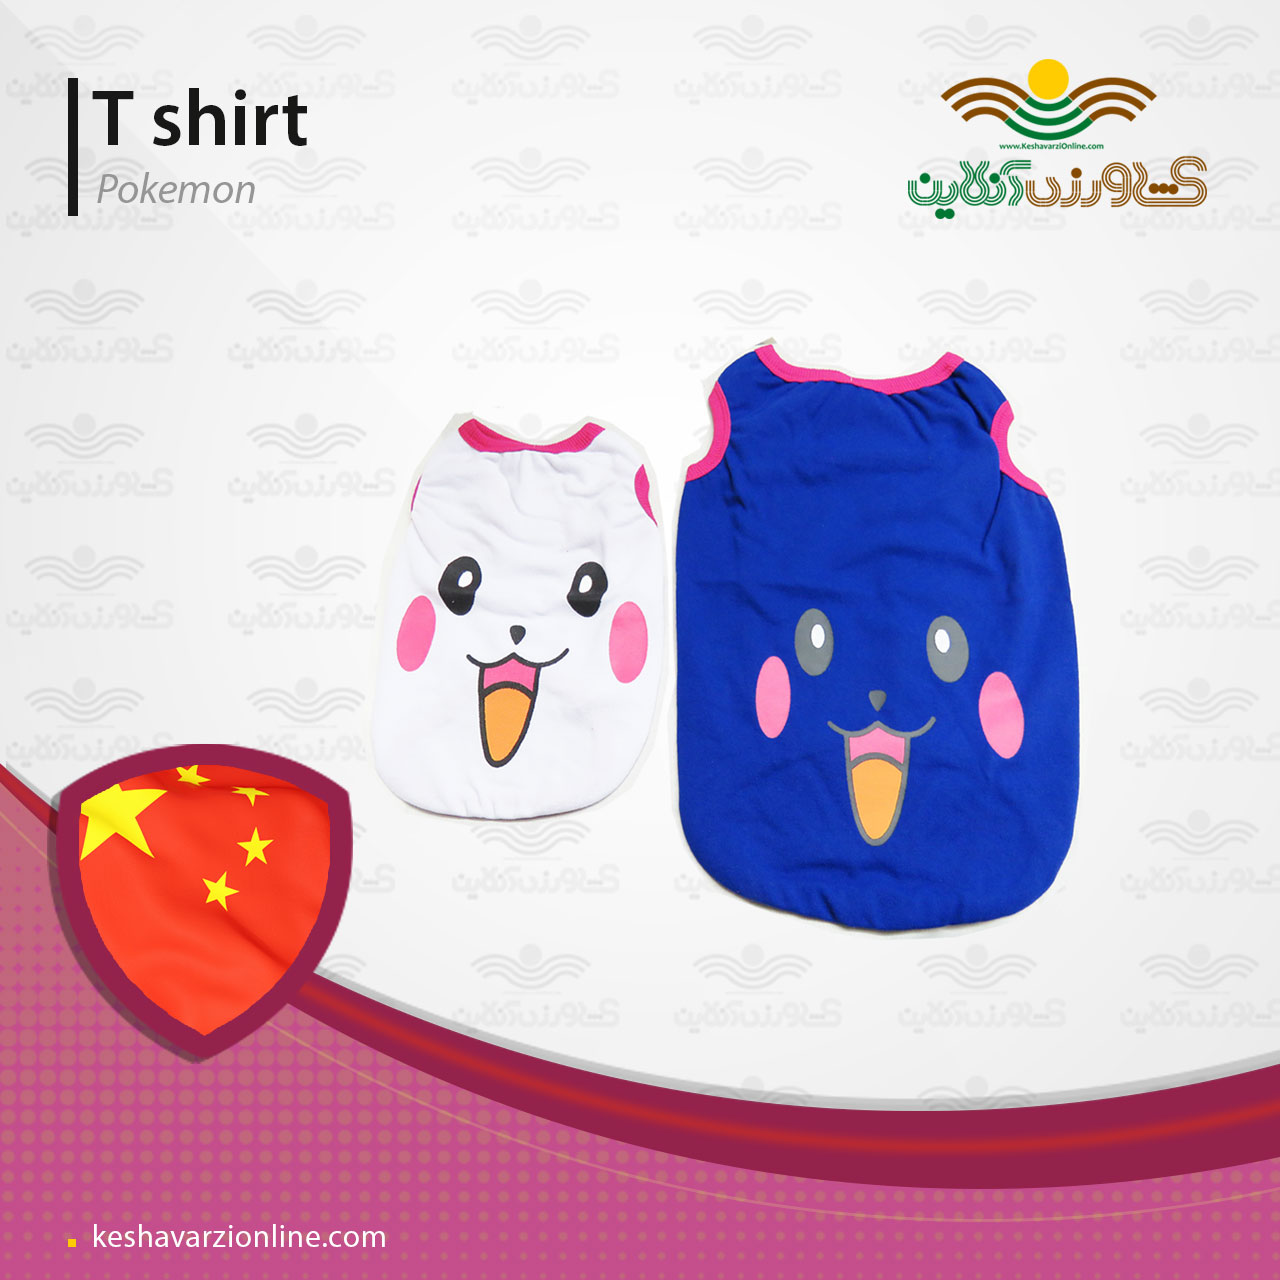 لباس سگ و گربه Pokemon